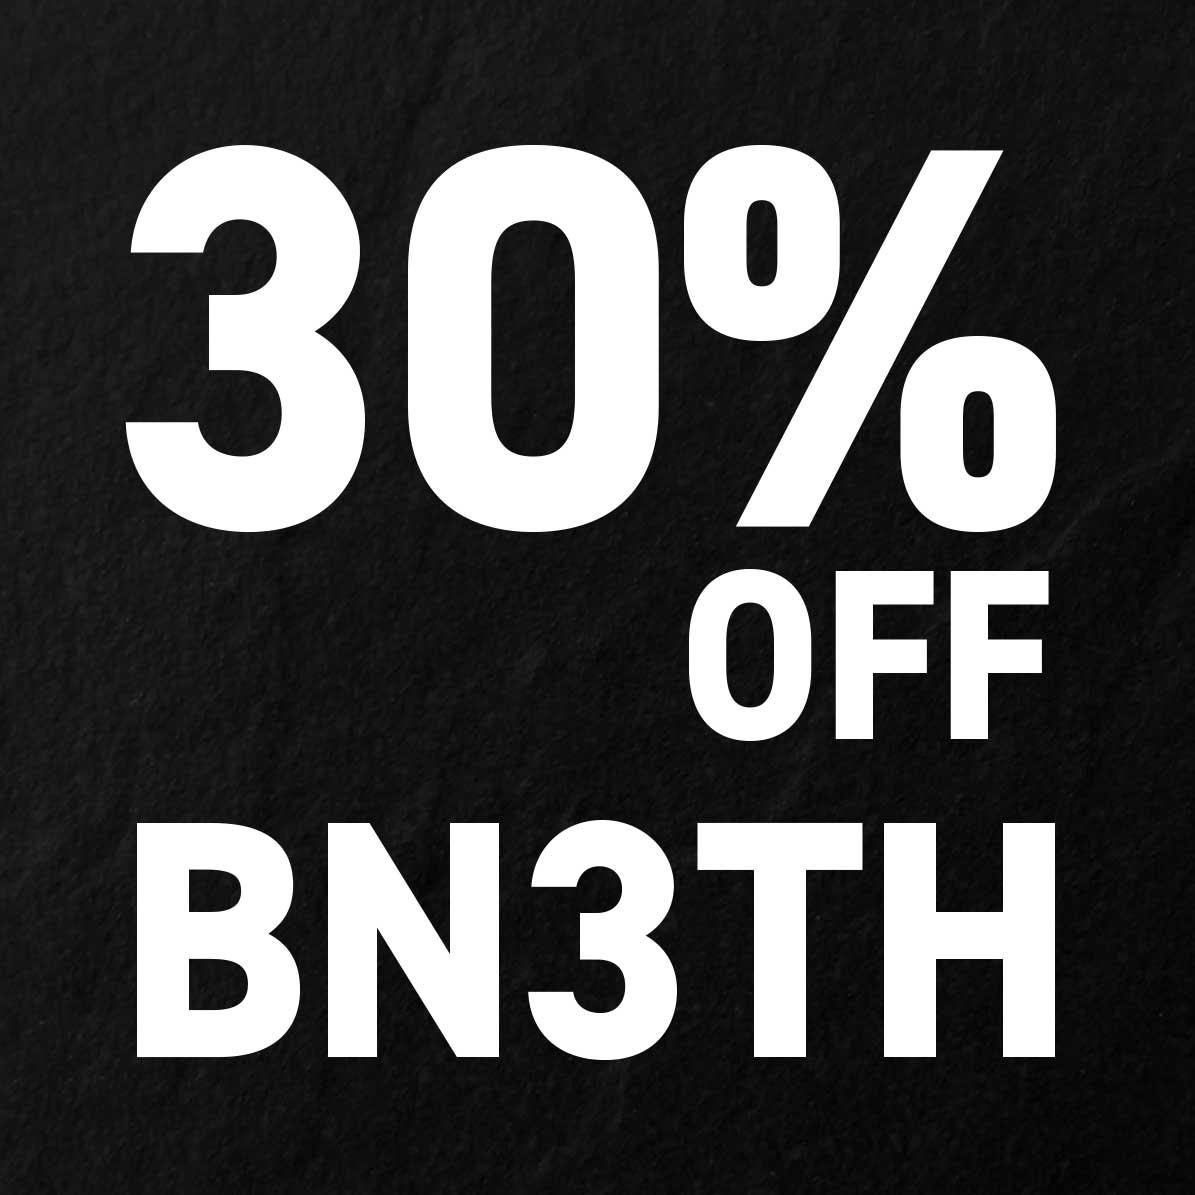 BN3TH | Topdrawers